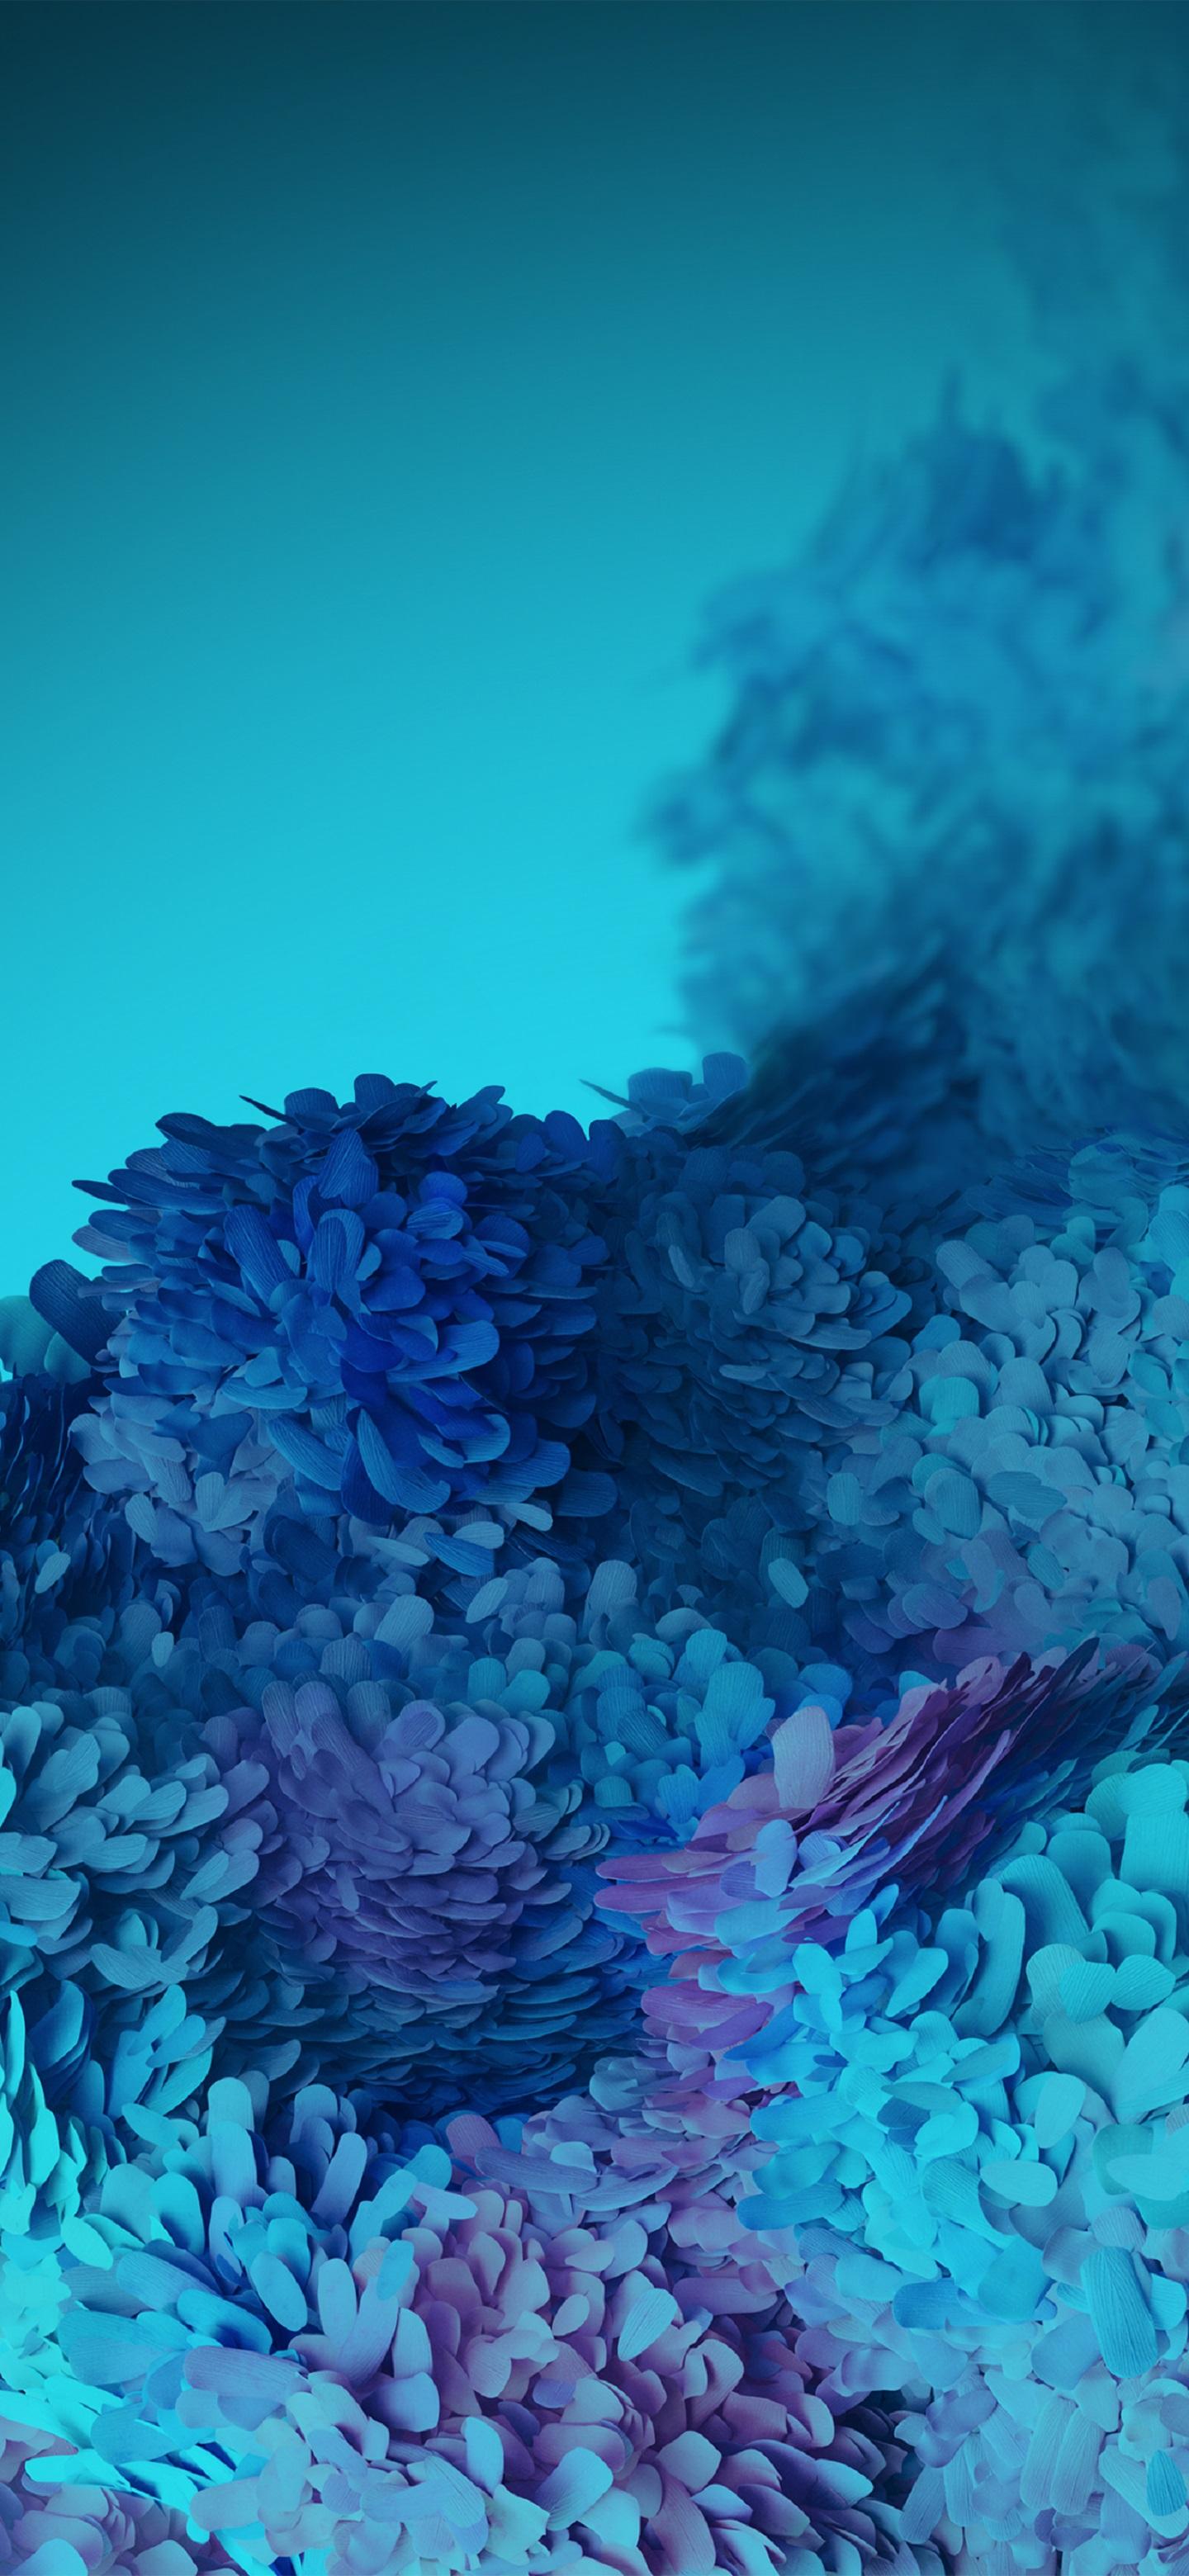 Samsung Galaxy S20 Wallpapers 1440x3120